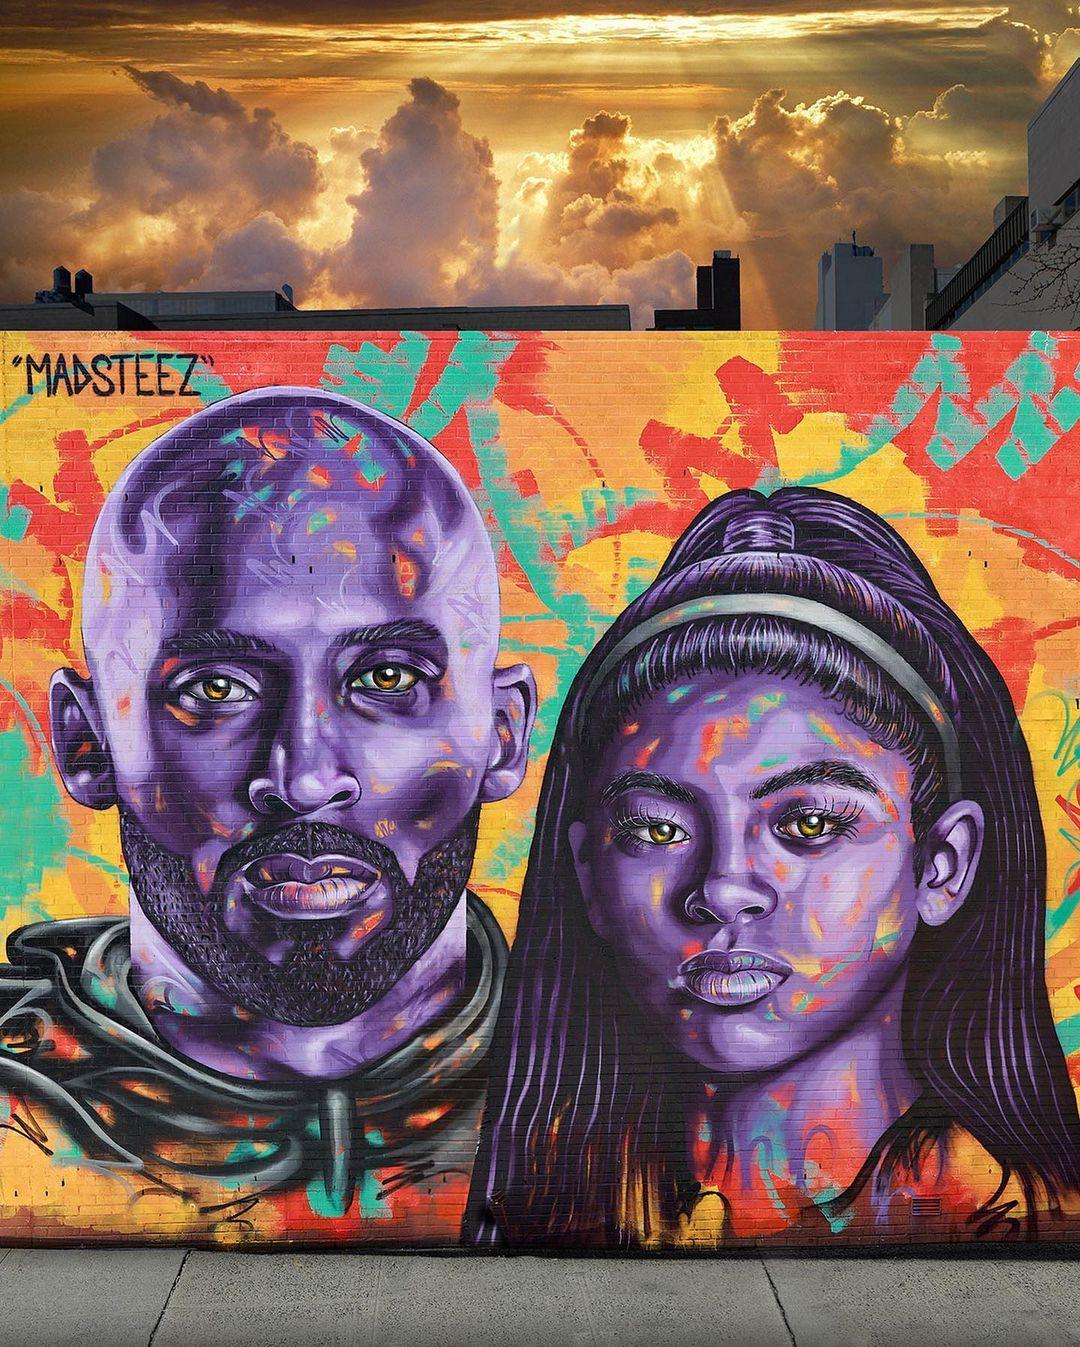 Artwork By Madsteez in New York City (Spray, Portrait)